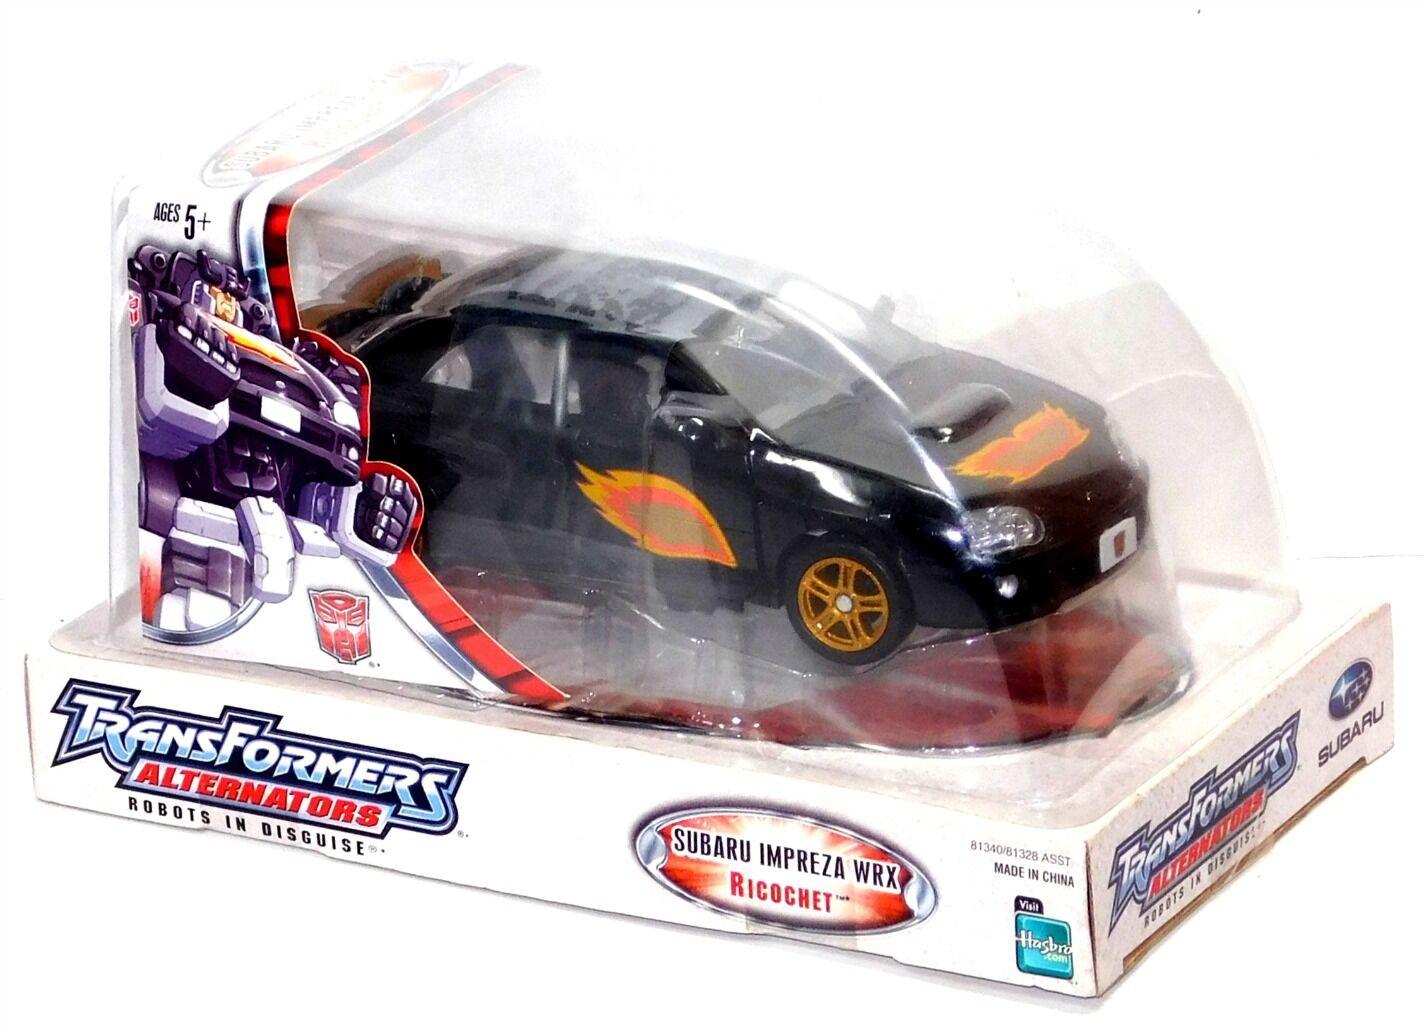 Transformers Alternators  24 Scale Ricochet Subaru Impreza